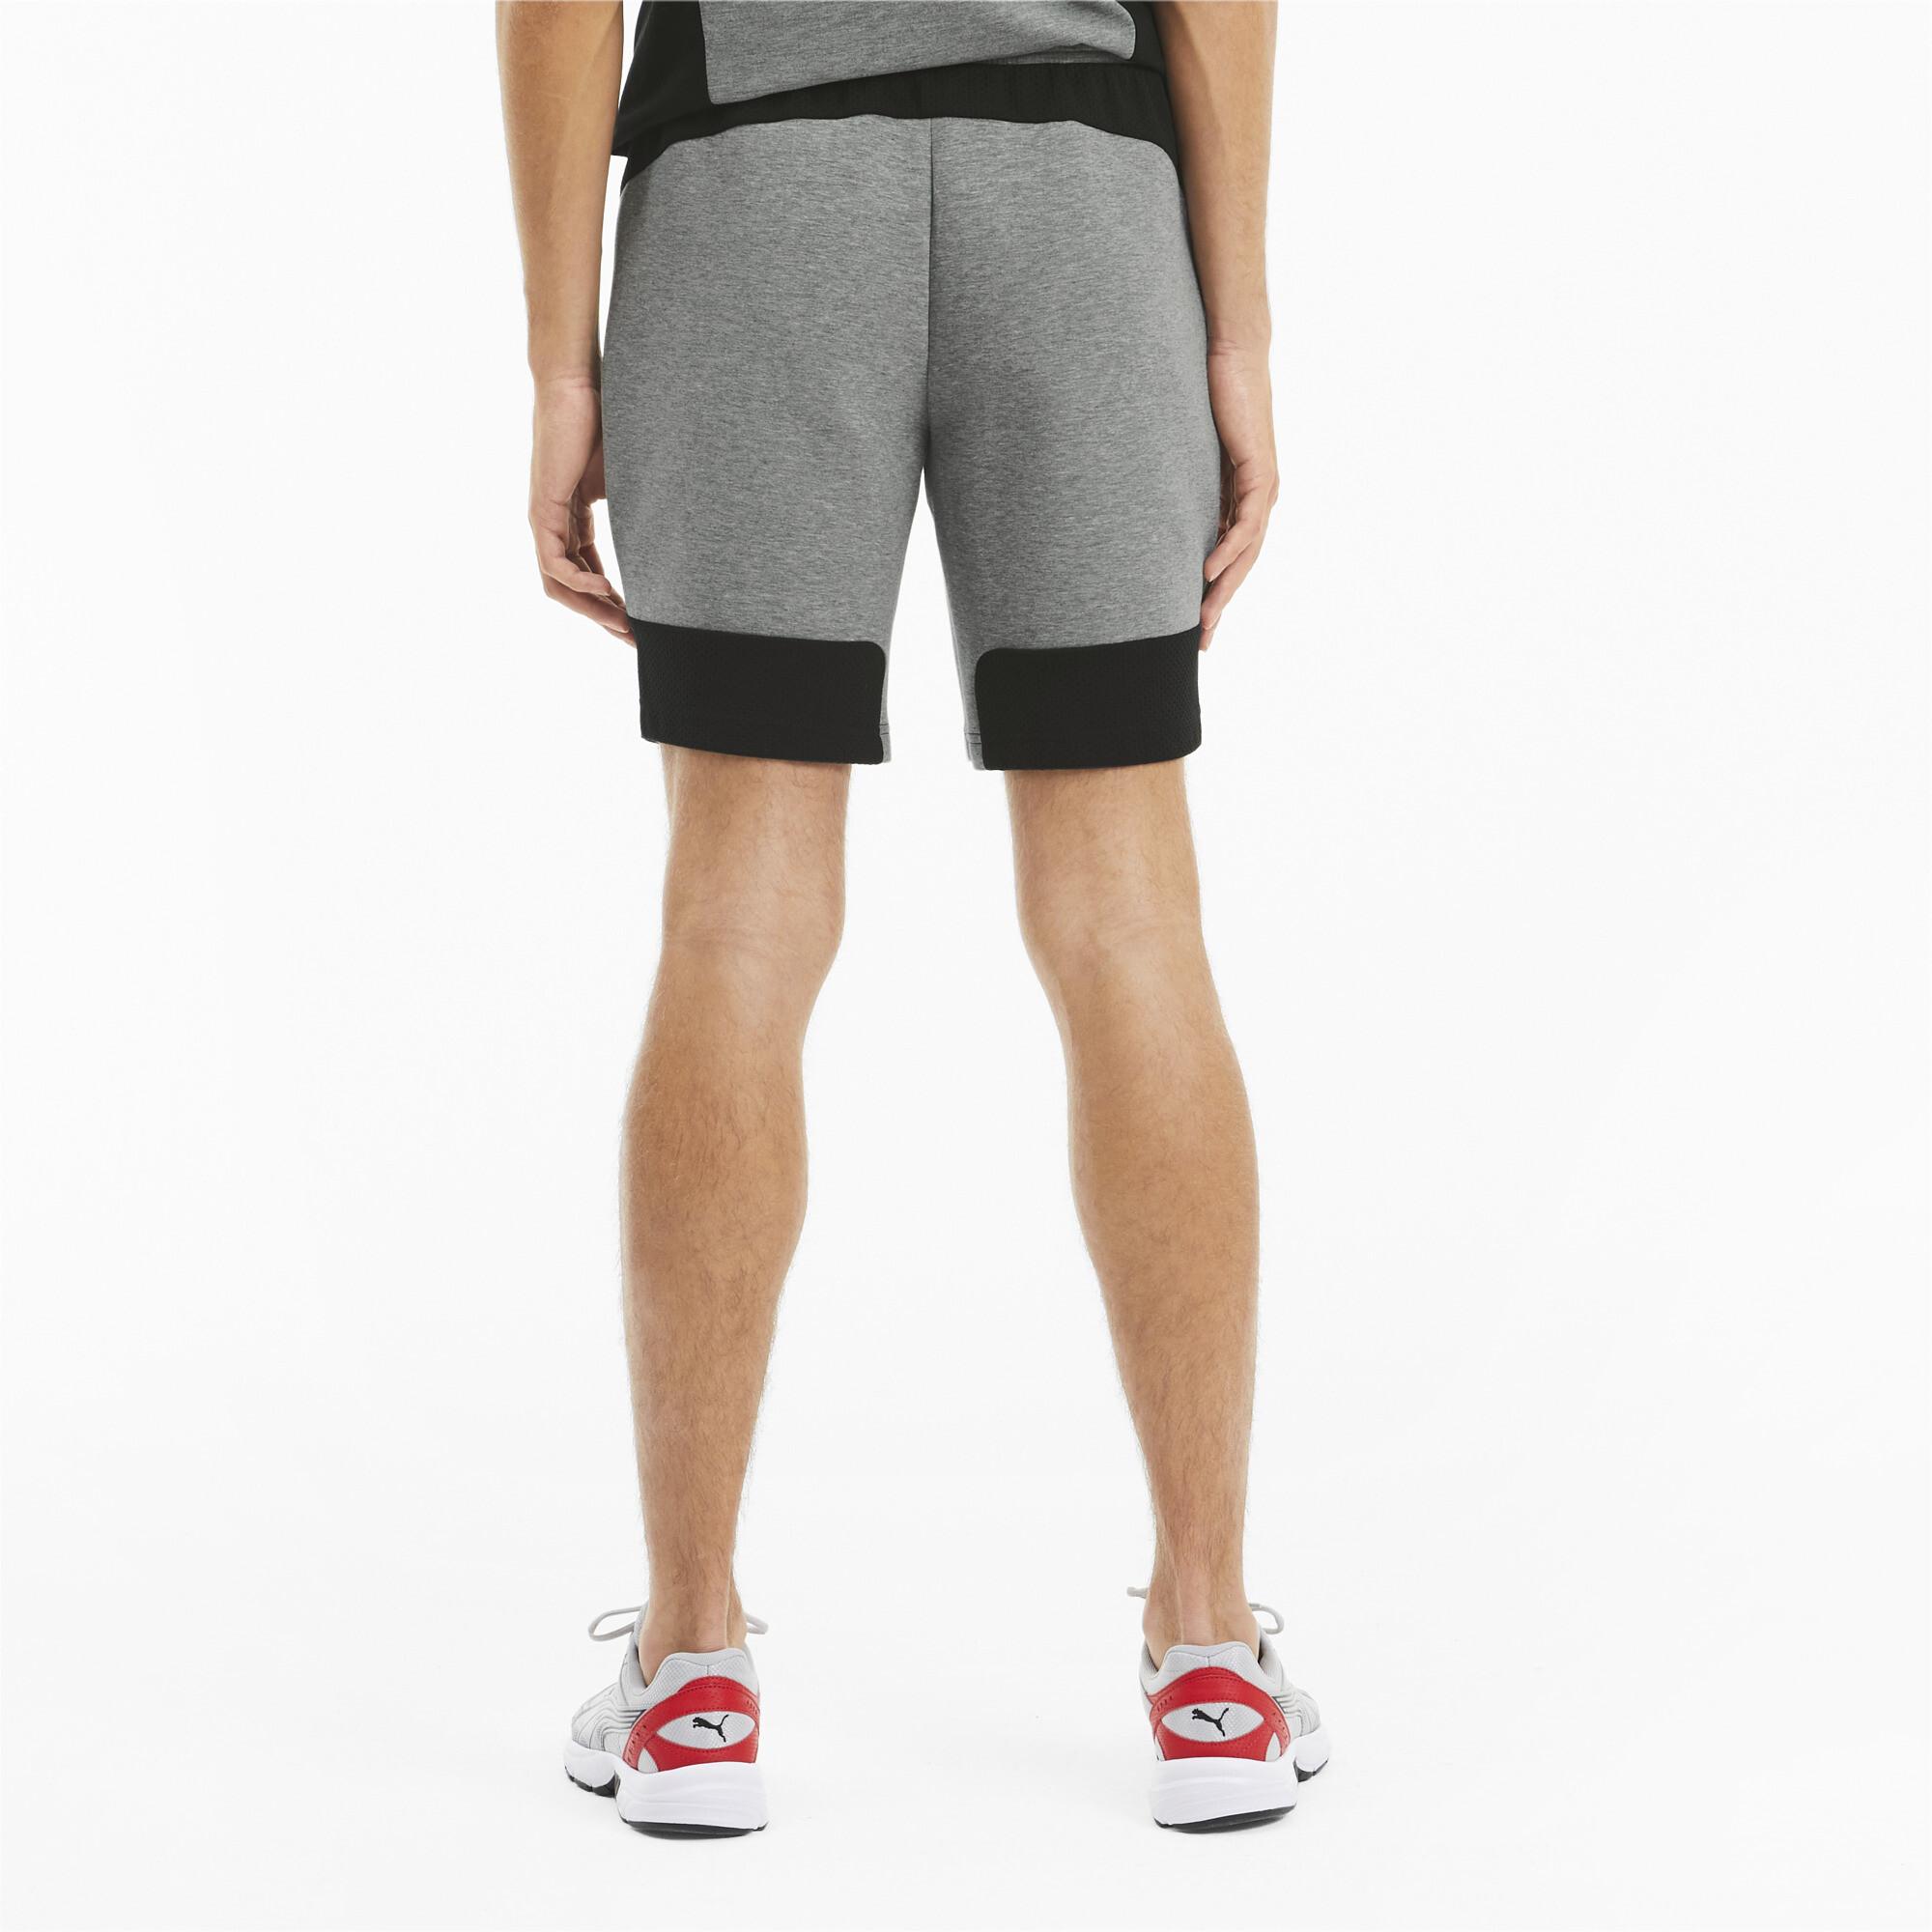 PUMA-Evostripe-Men-039-s-Shorts-Men-Knitted-Shorts-Basics thumbnail 16